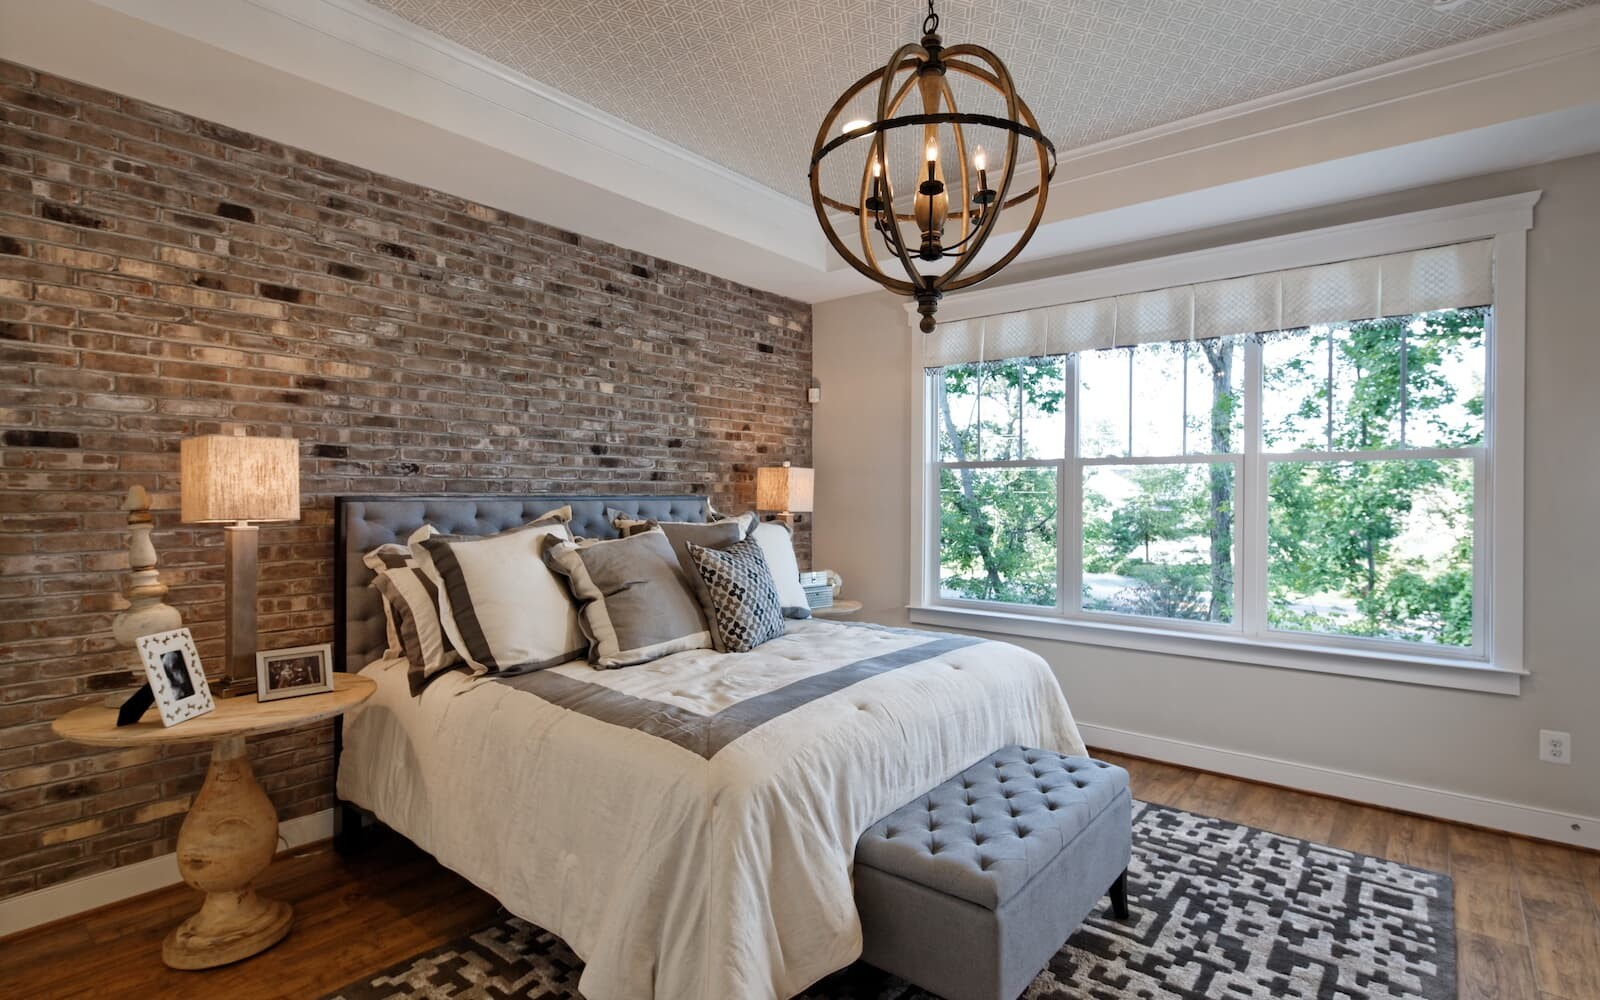 TaylorII-bedroom-single-family-homes-easton-md-easton-village-brookfield-residential.jpg